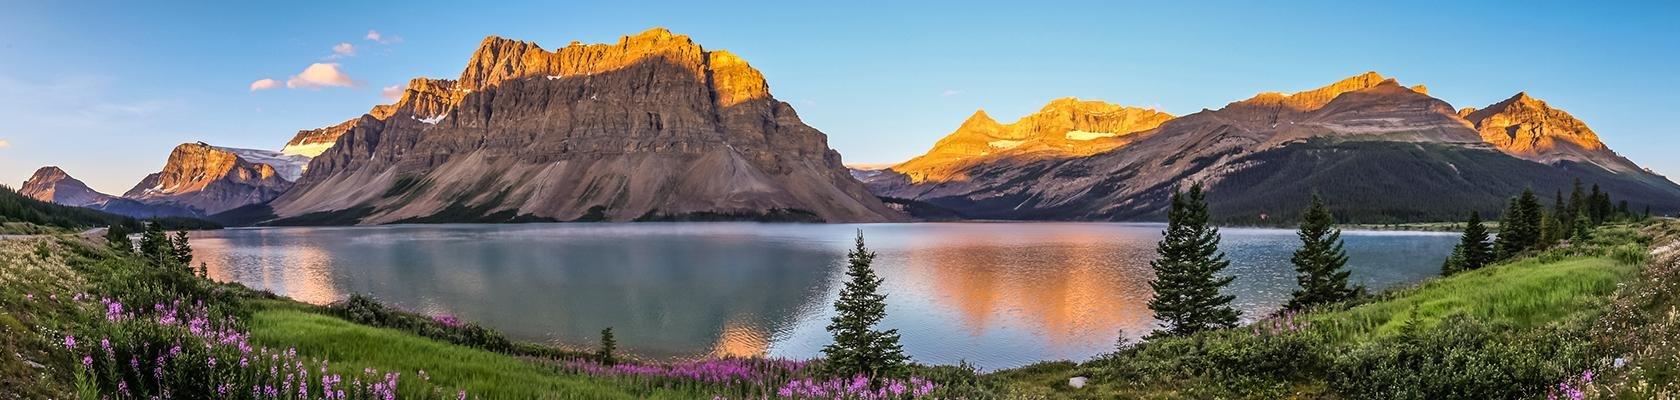 Banff Nationaal Park (Canada)